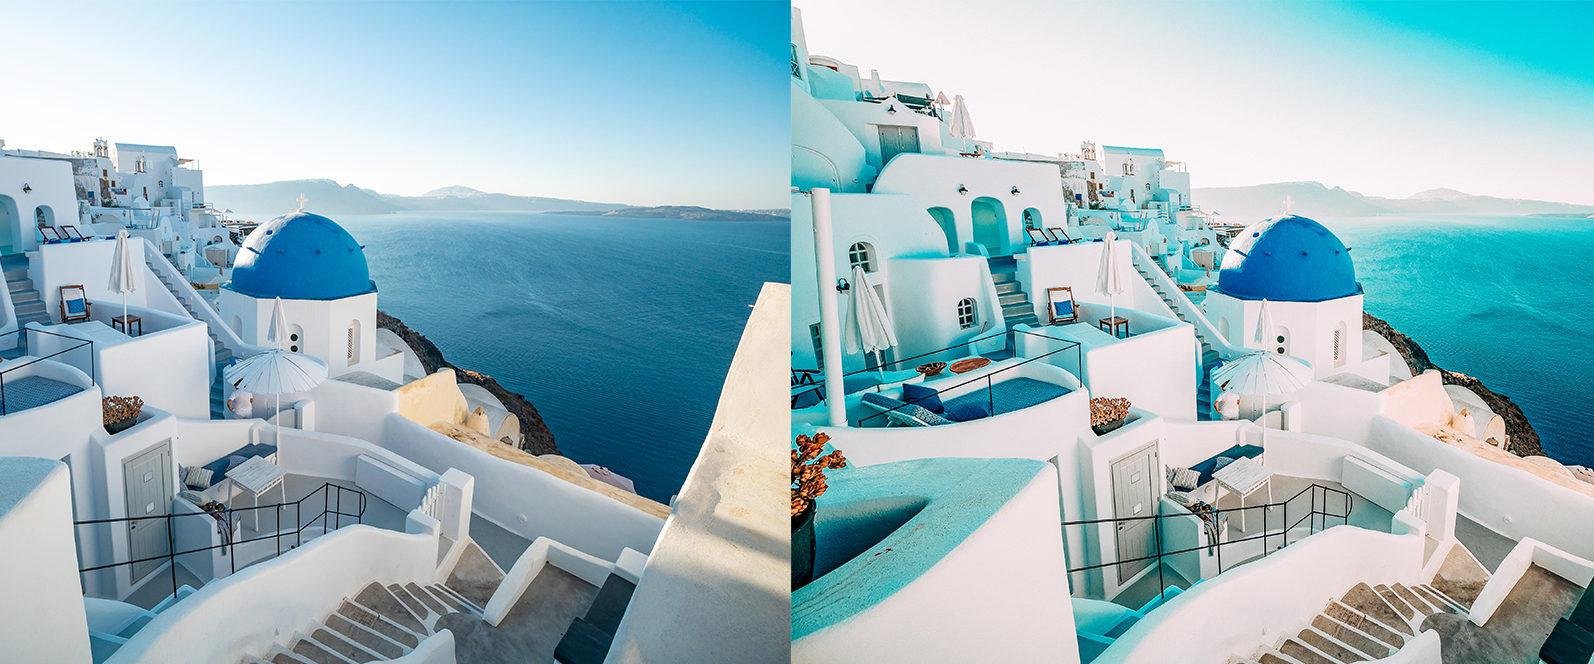 14 x Greece Lightroom Presets   Mobile and Desktop - 8 Greece 1 -